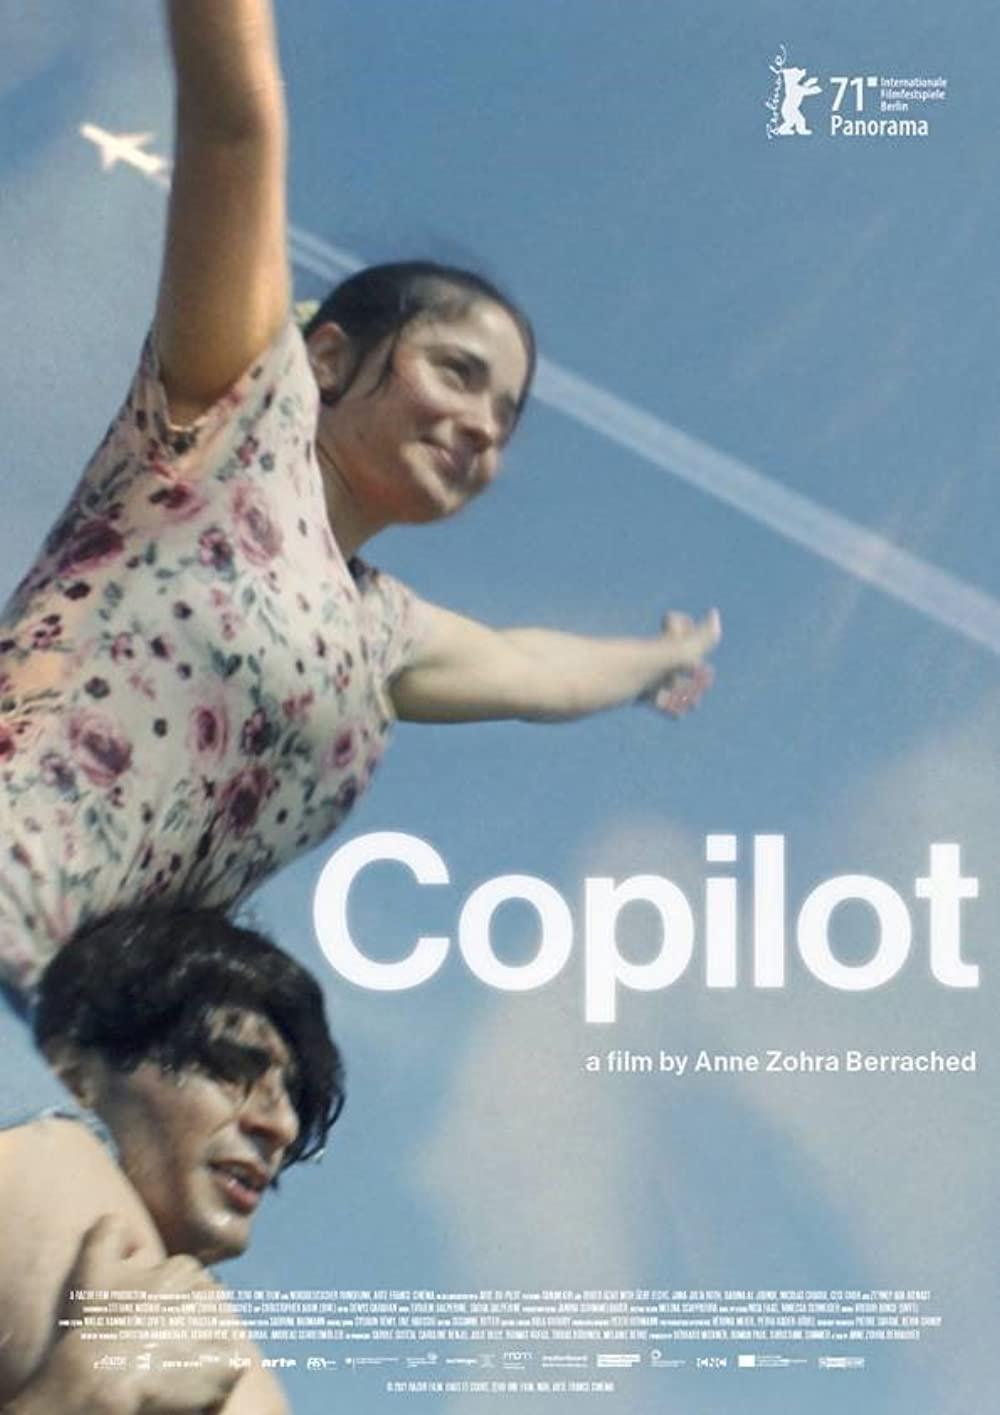 copilot movie poster